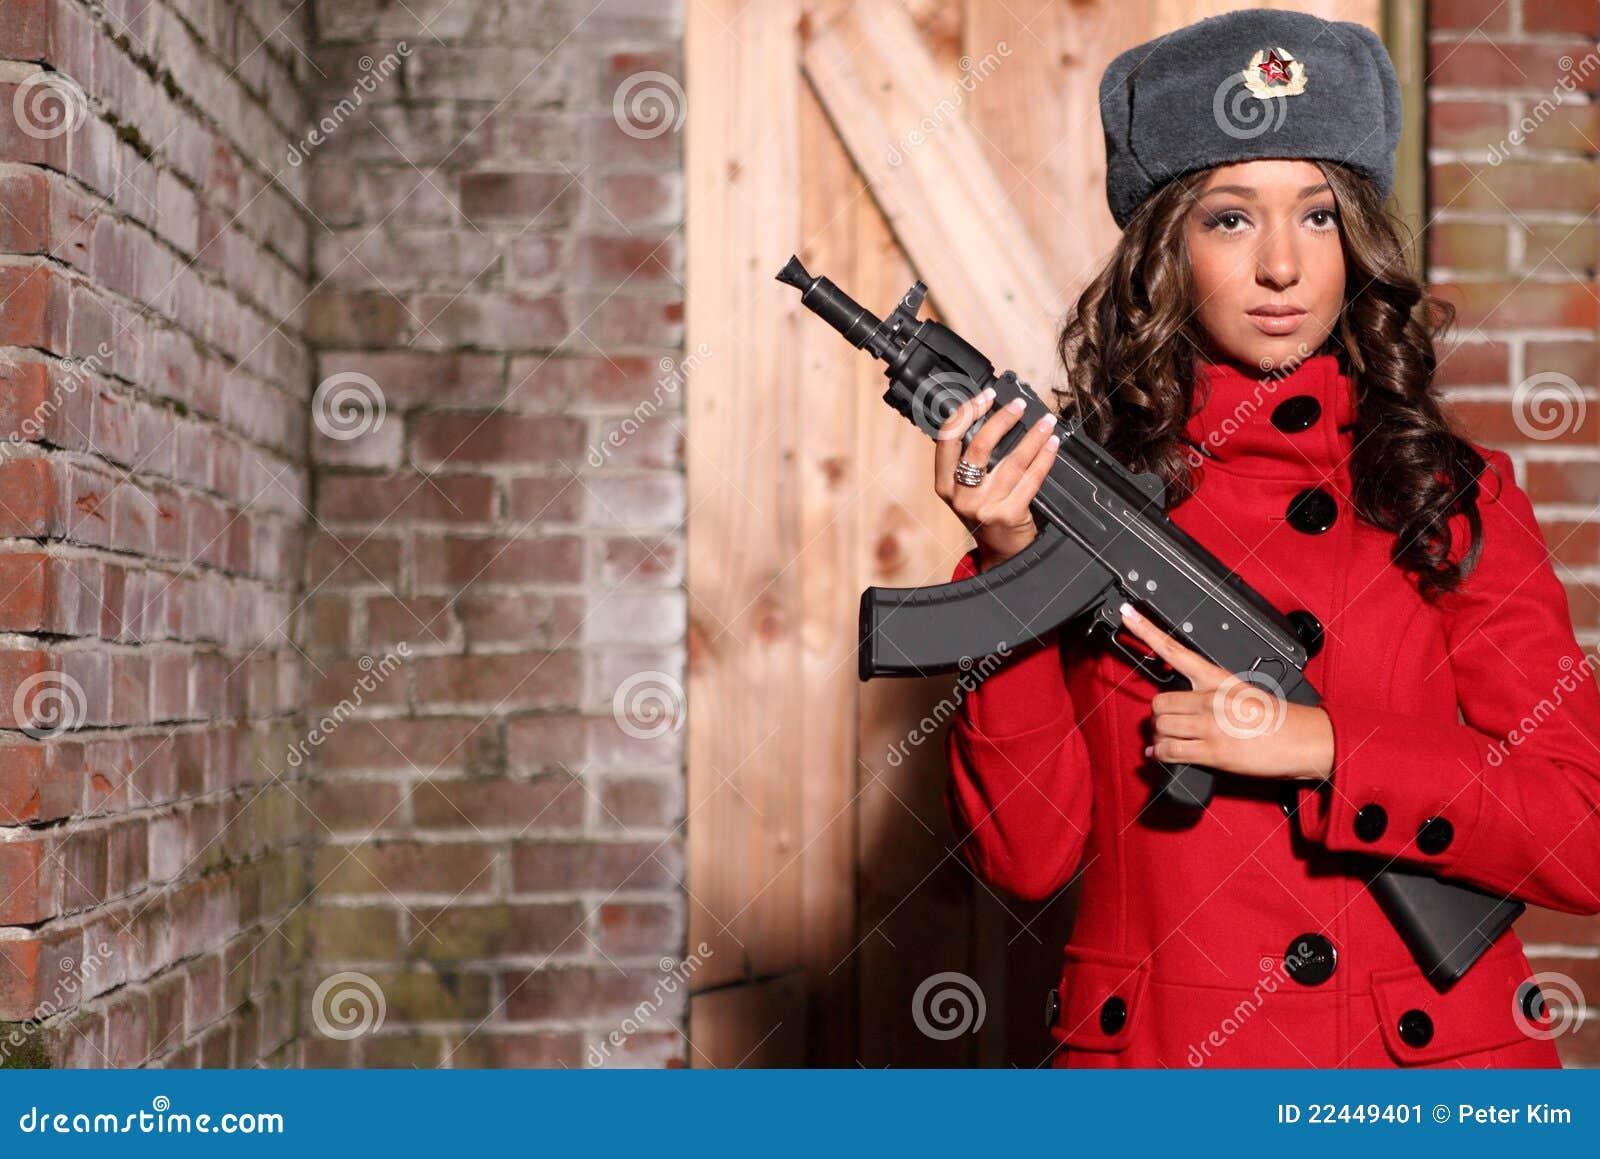 Femme russe a vendre